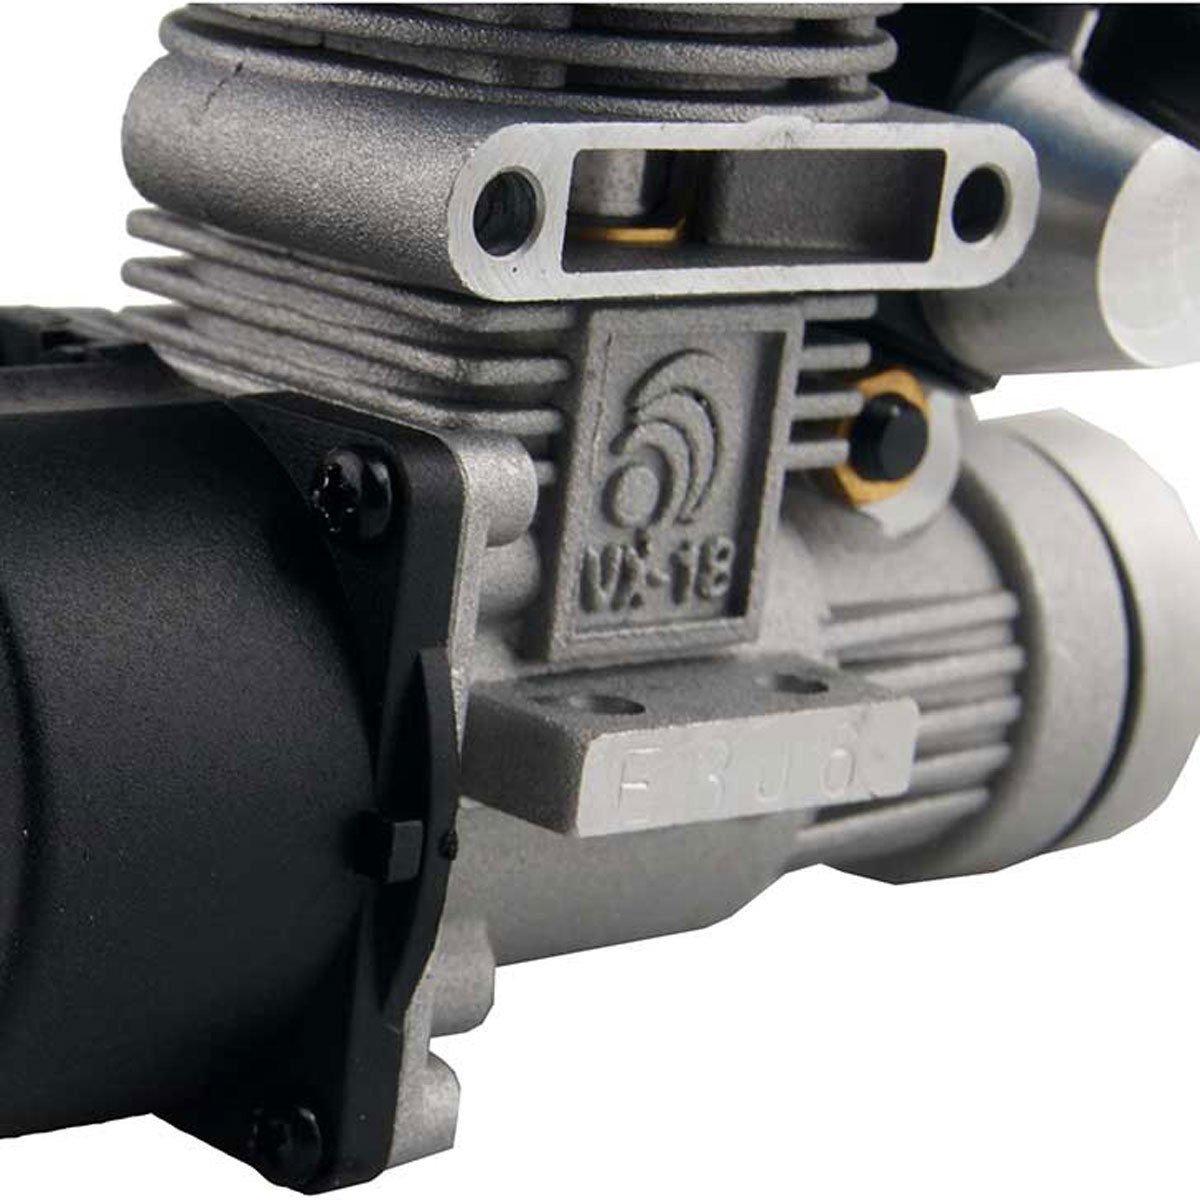 Toyoutdoorparts RC 02060 Purple VX 18 Engine 2.74cc Pull Starter For HSP 1:10 Nitro Car EG630